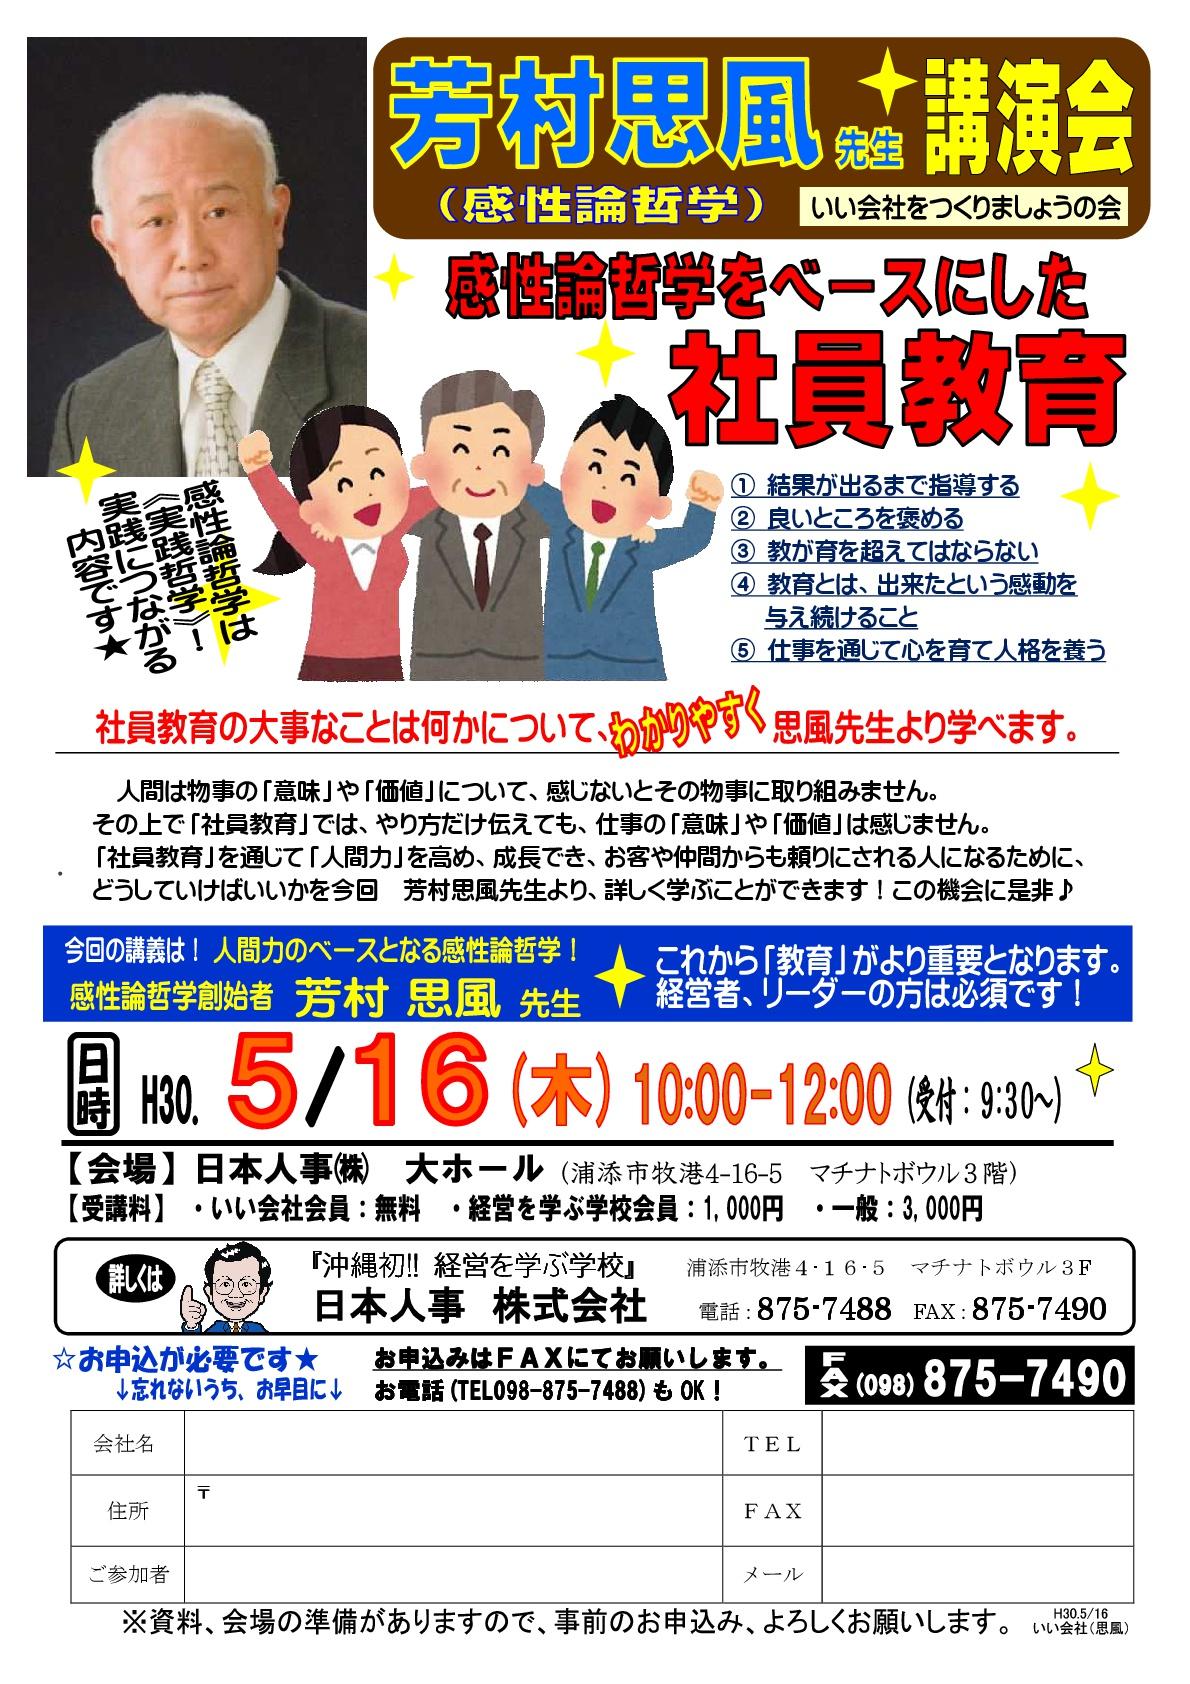 o1190168414190689551 1 - 5月16日(水)沖縄講演会